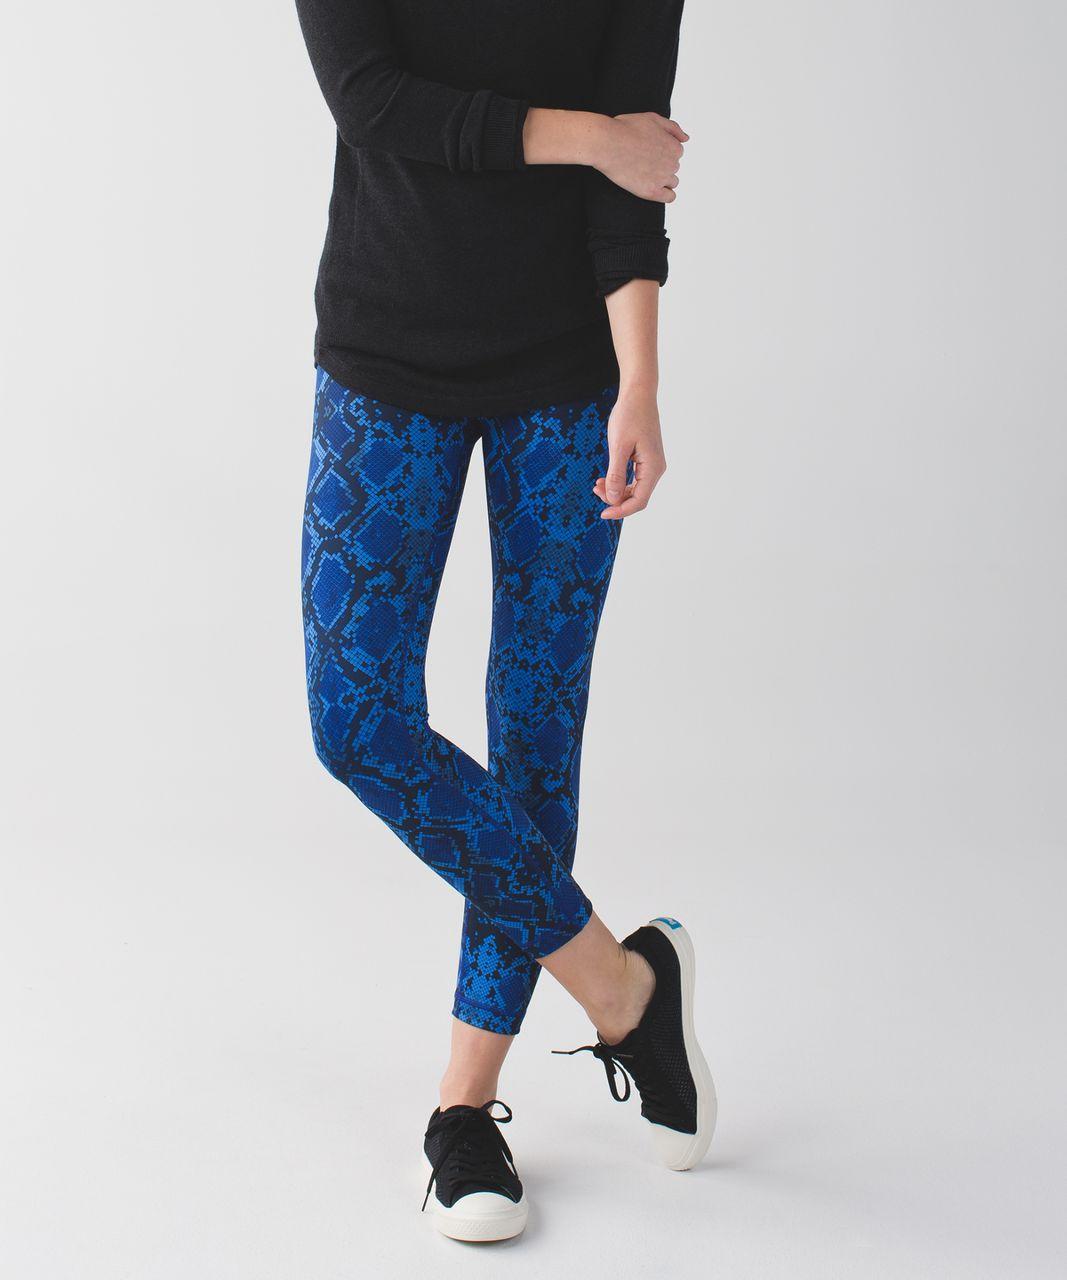 Lululemon High Times Pant *Full-On Luon - Mini Ziggy Snake Pipe Dream Blue Sapphire Blue